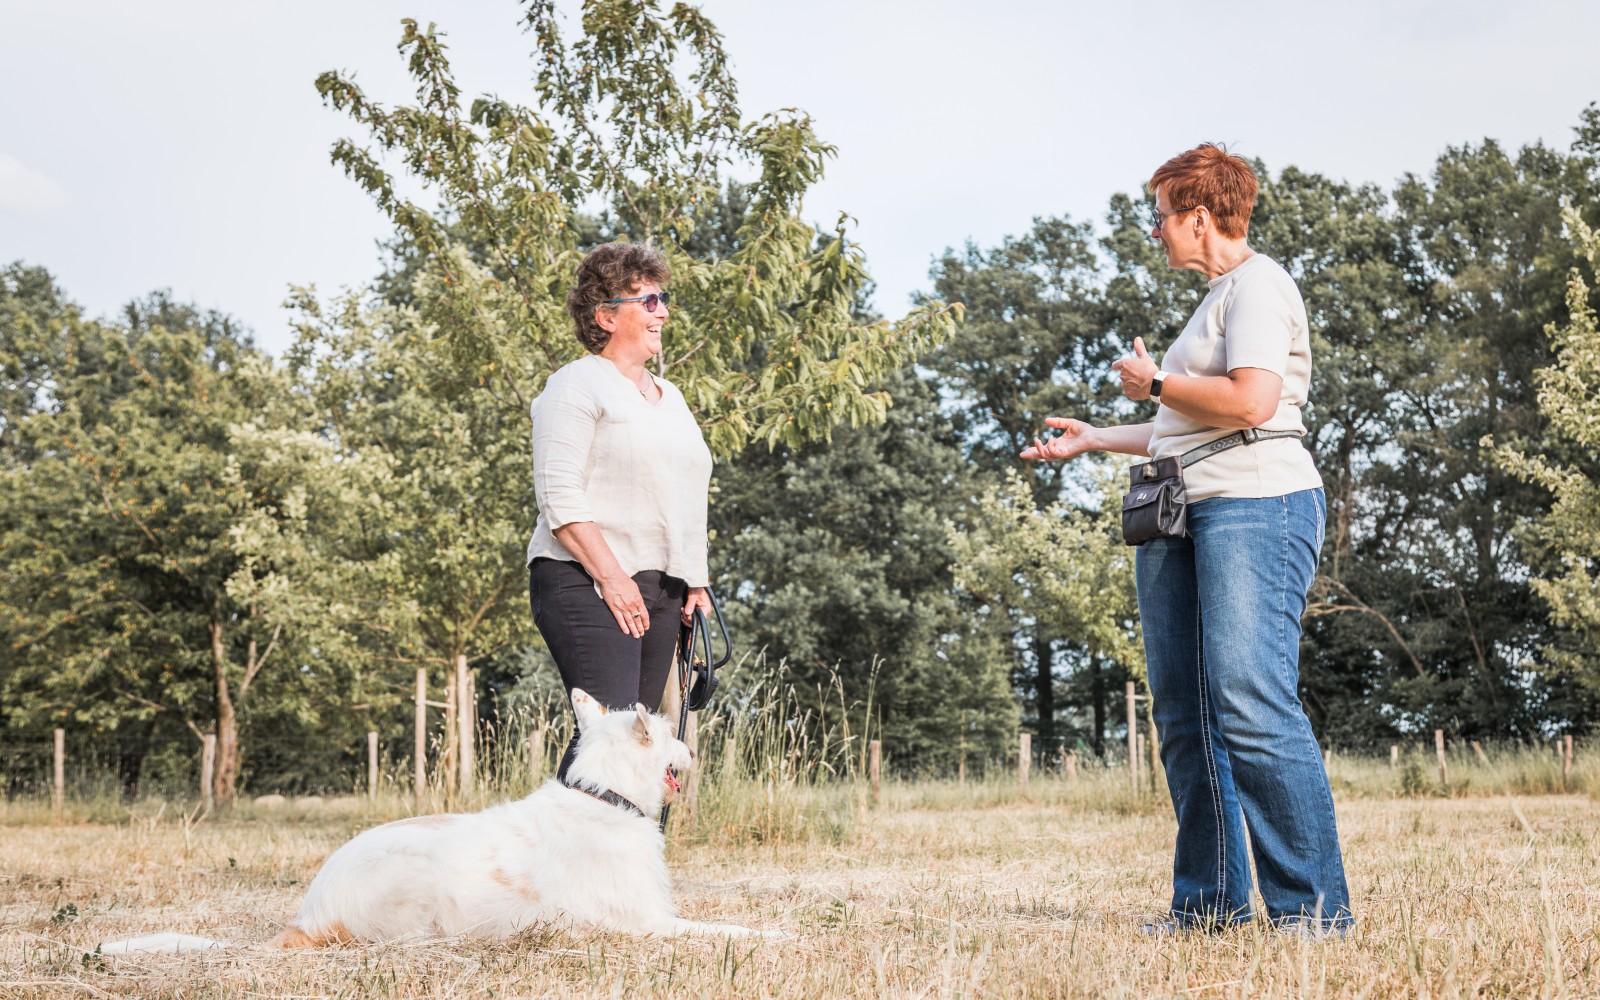 Individuelles Hundetraining